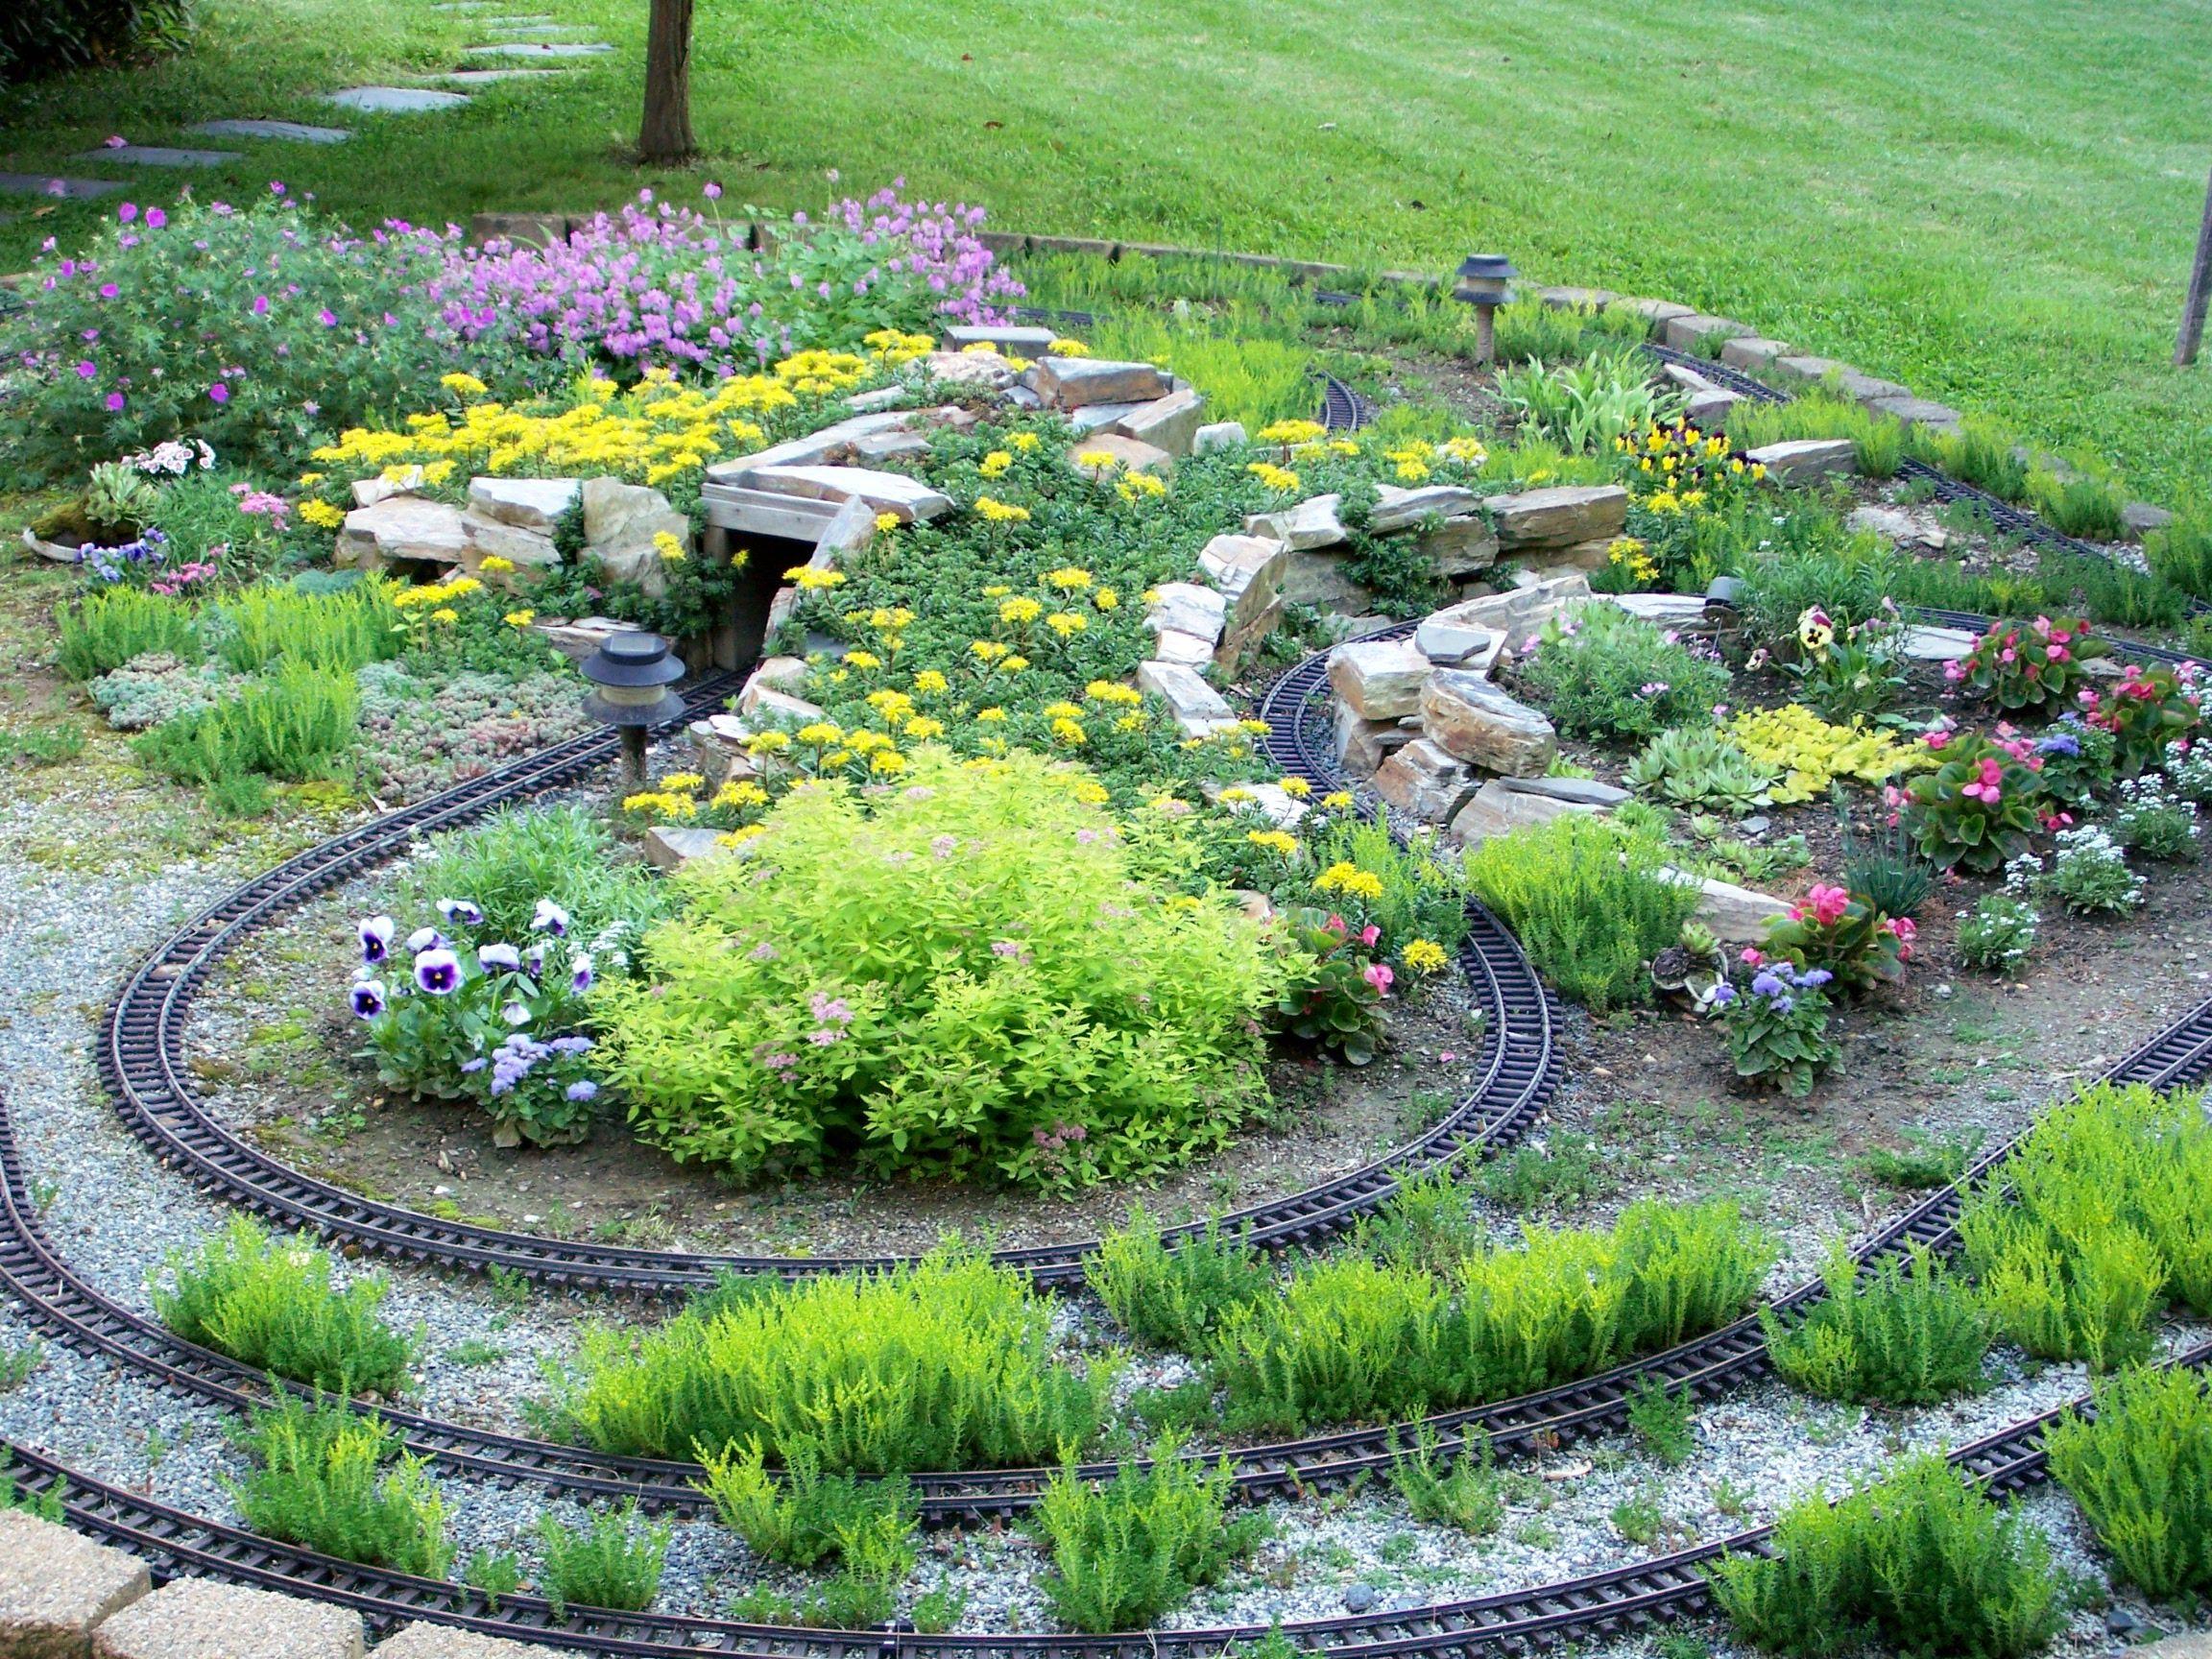 sugg model train garden g scale model train gardens and models